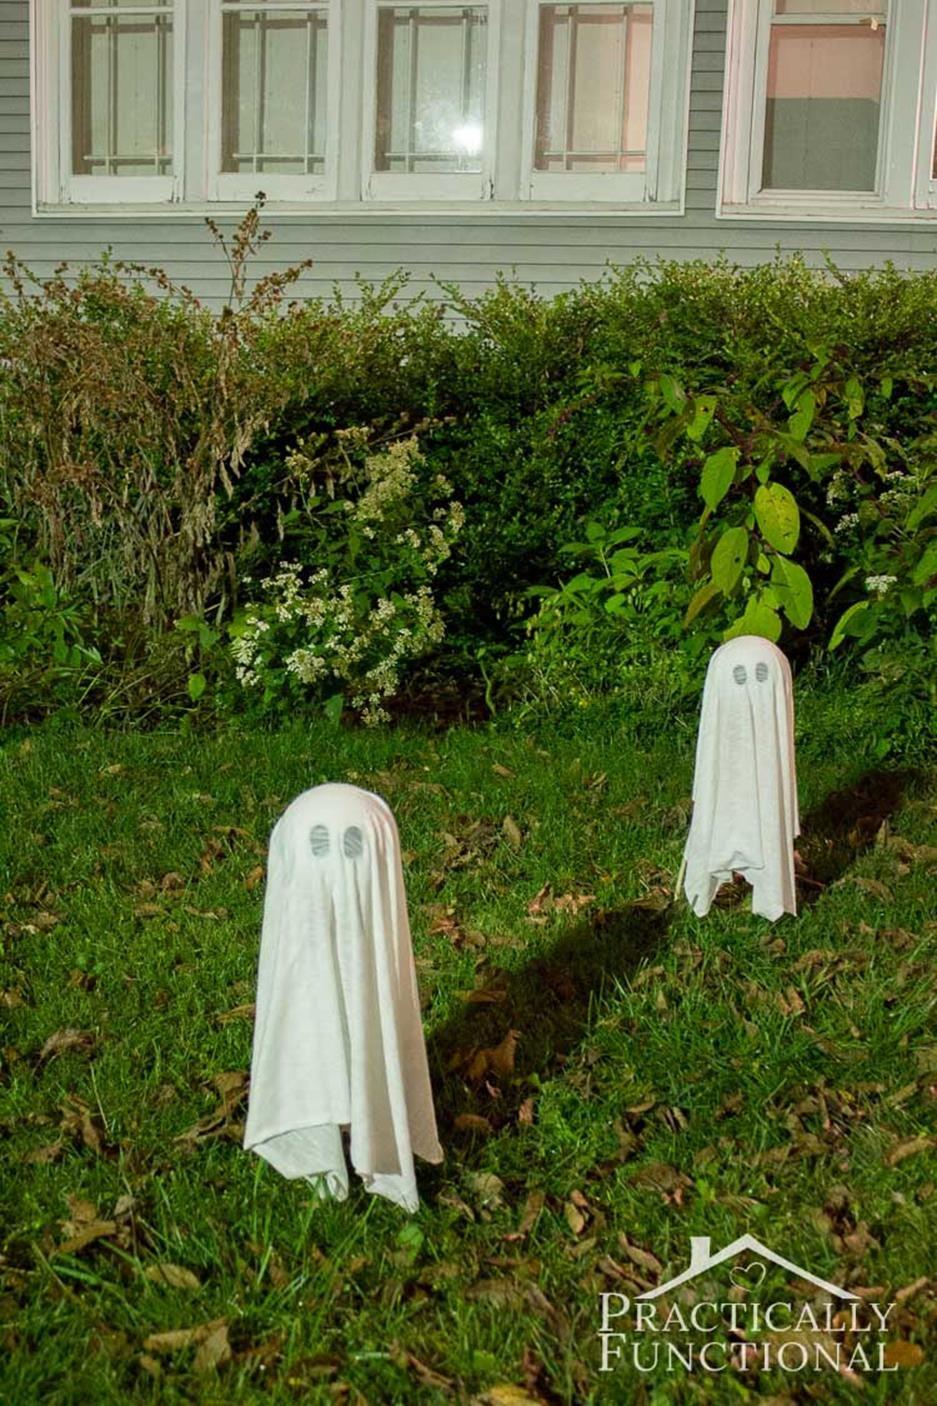 15 Homemade Diy Outdoor Halloween Decorations To Copy Now Halloween Diy Outdoor Halloween Yard Decorations Halloween Decorations Diy Outdoor